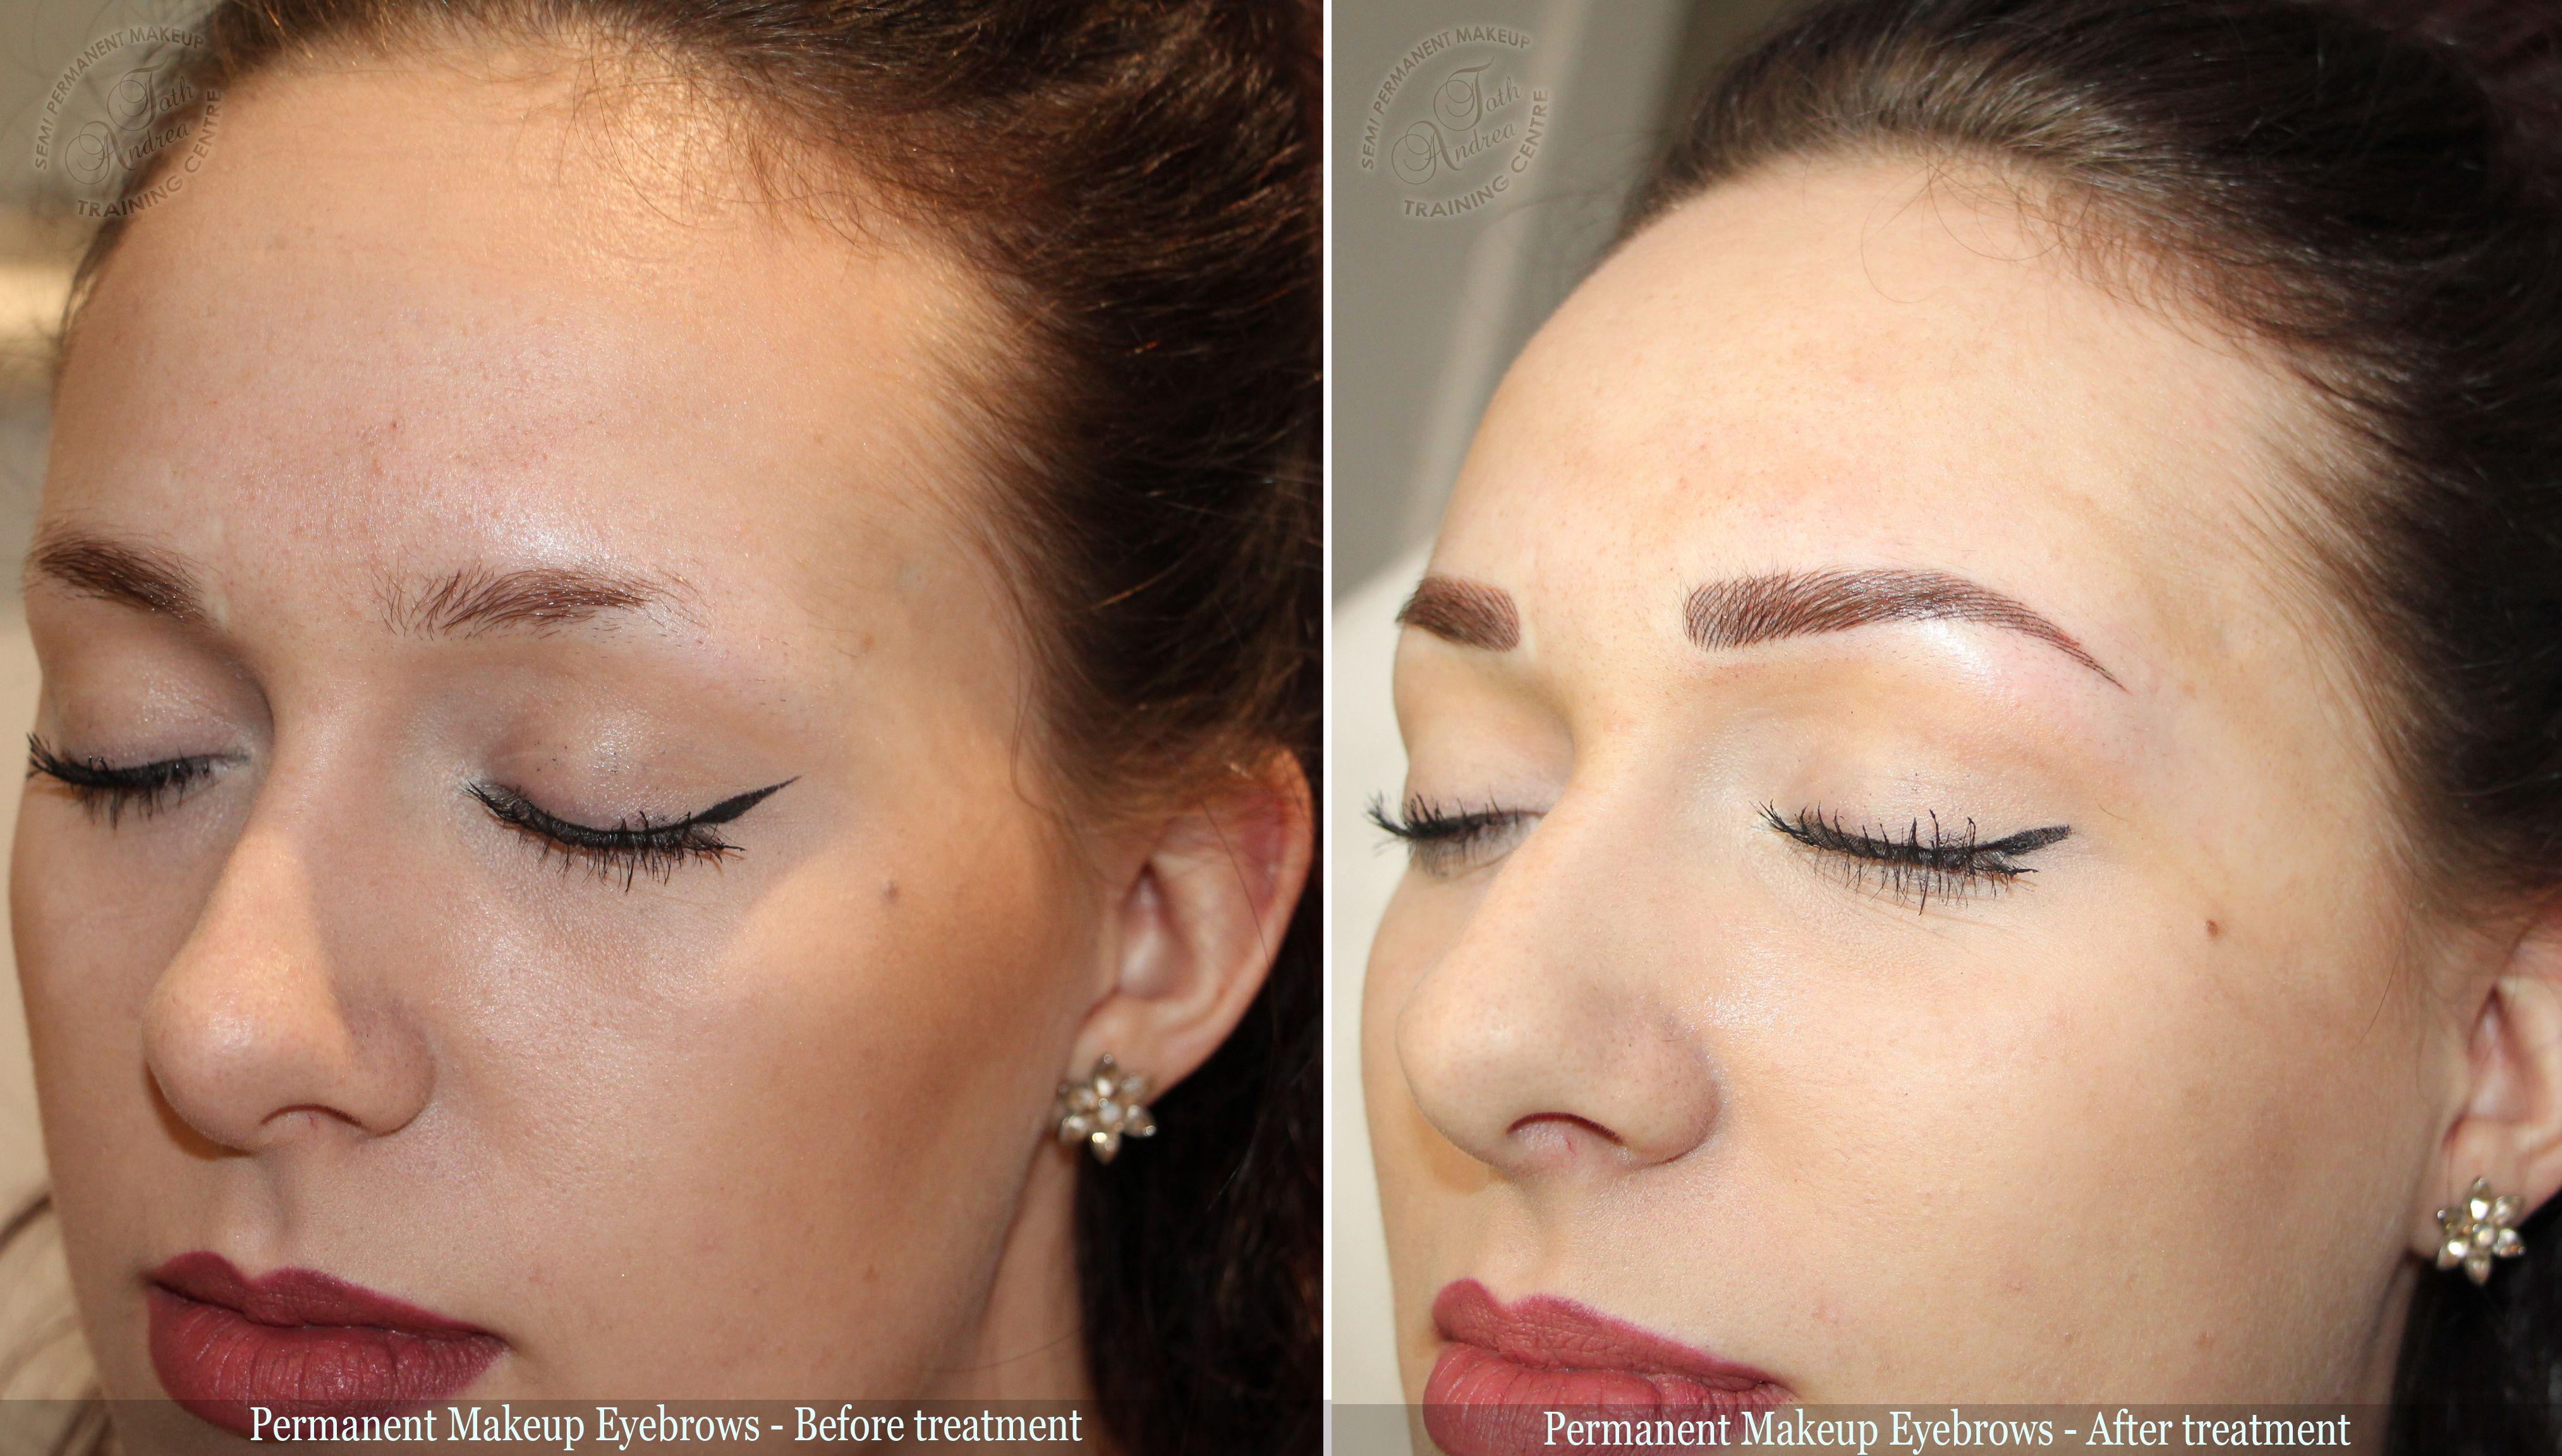 Permanent Makeup Basic Training 👩💼🇬🇧 30 OFF £3,900